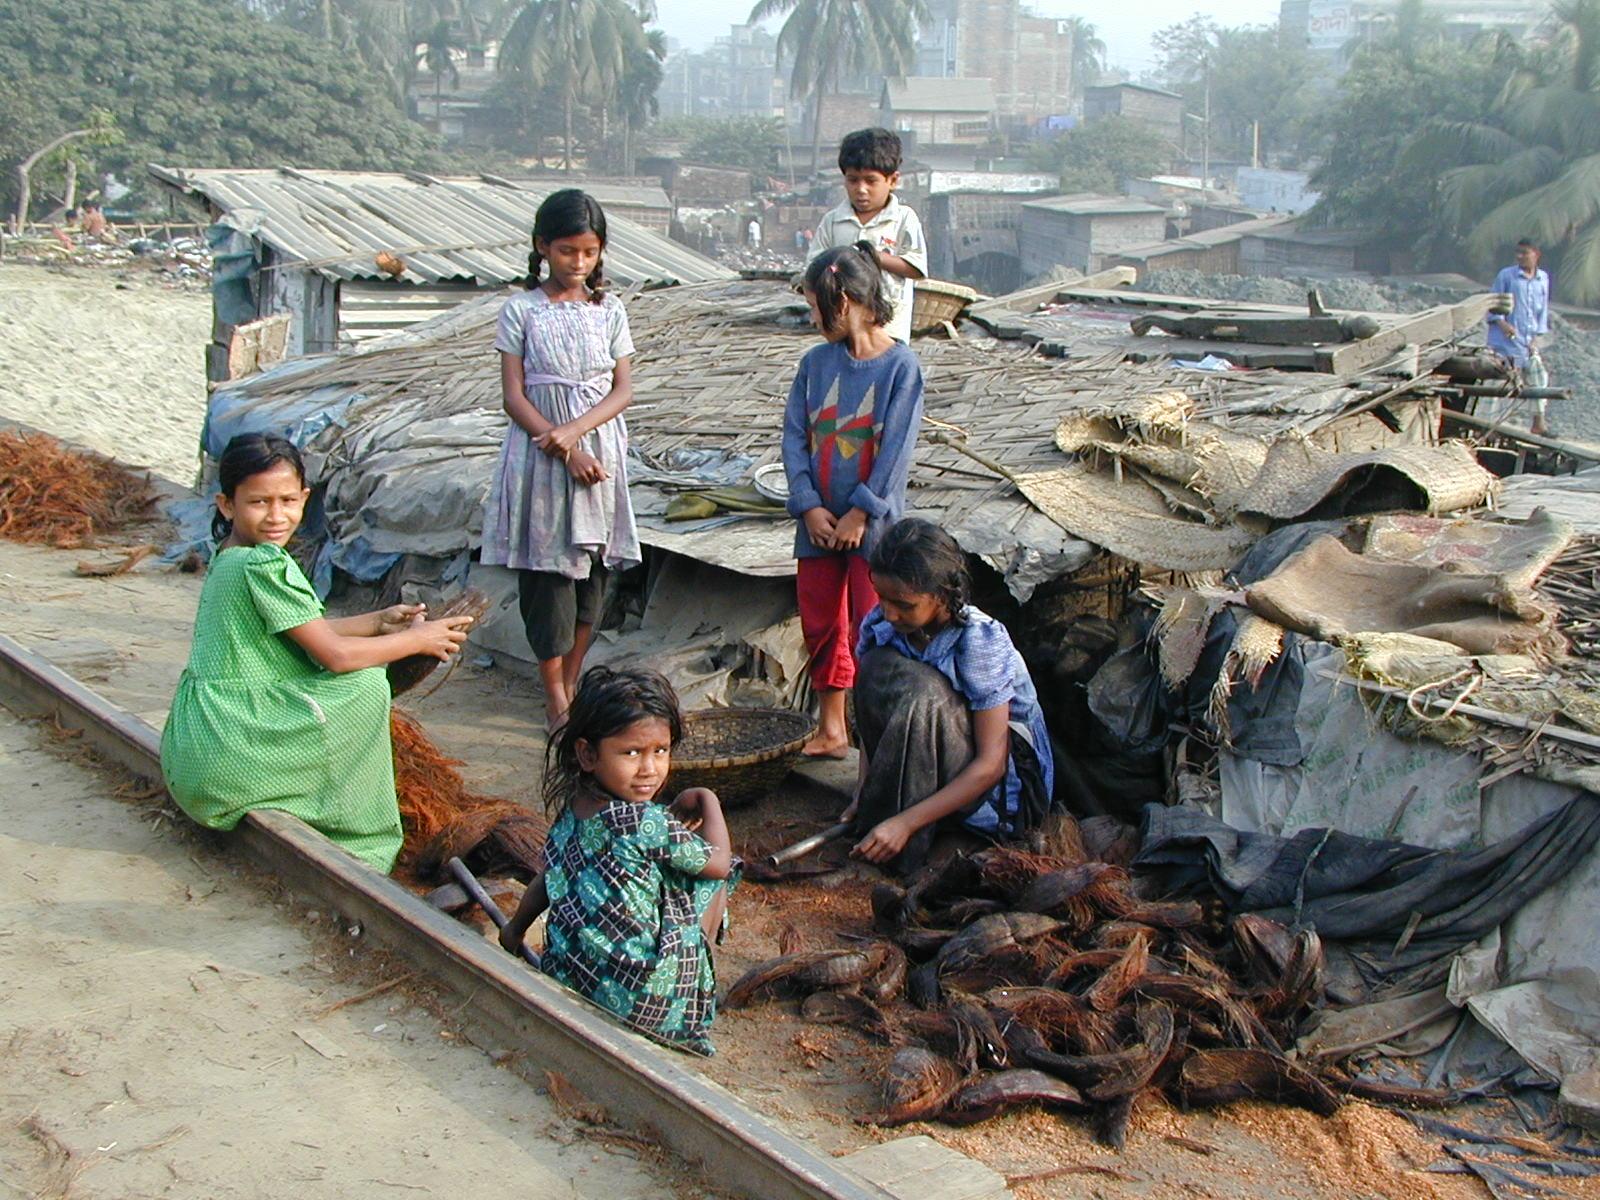 Leben-im-Slum-Dhaka-Bangladesch.jpg